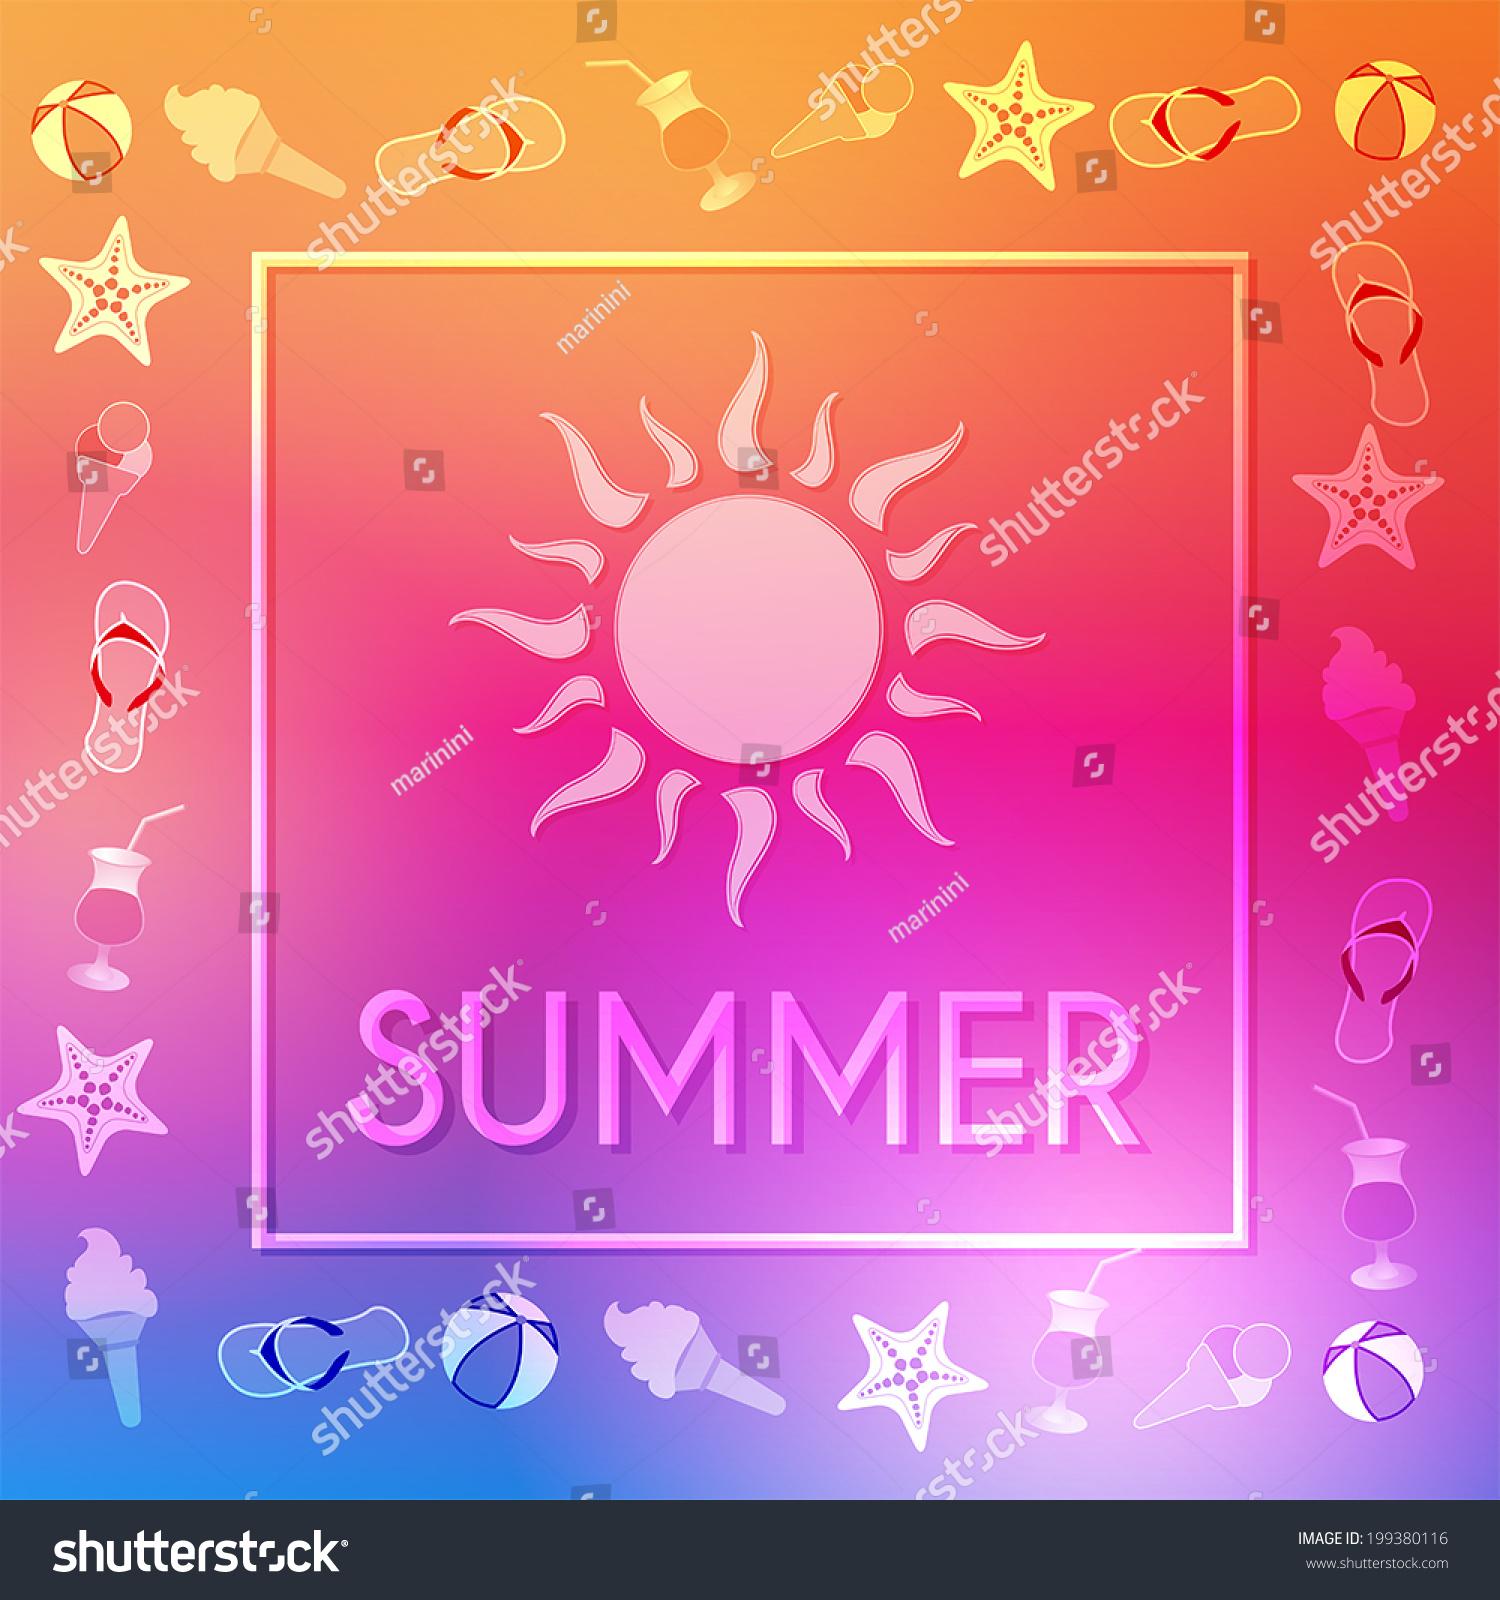 Text Summer Sun Summery Symbols Frame Stock Vector Royalty Free